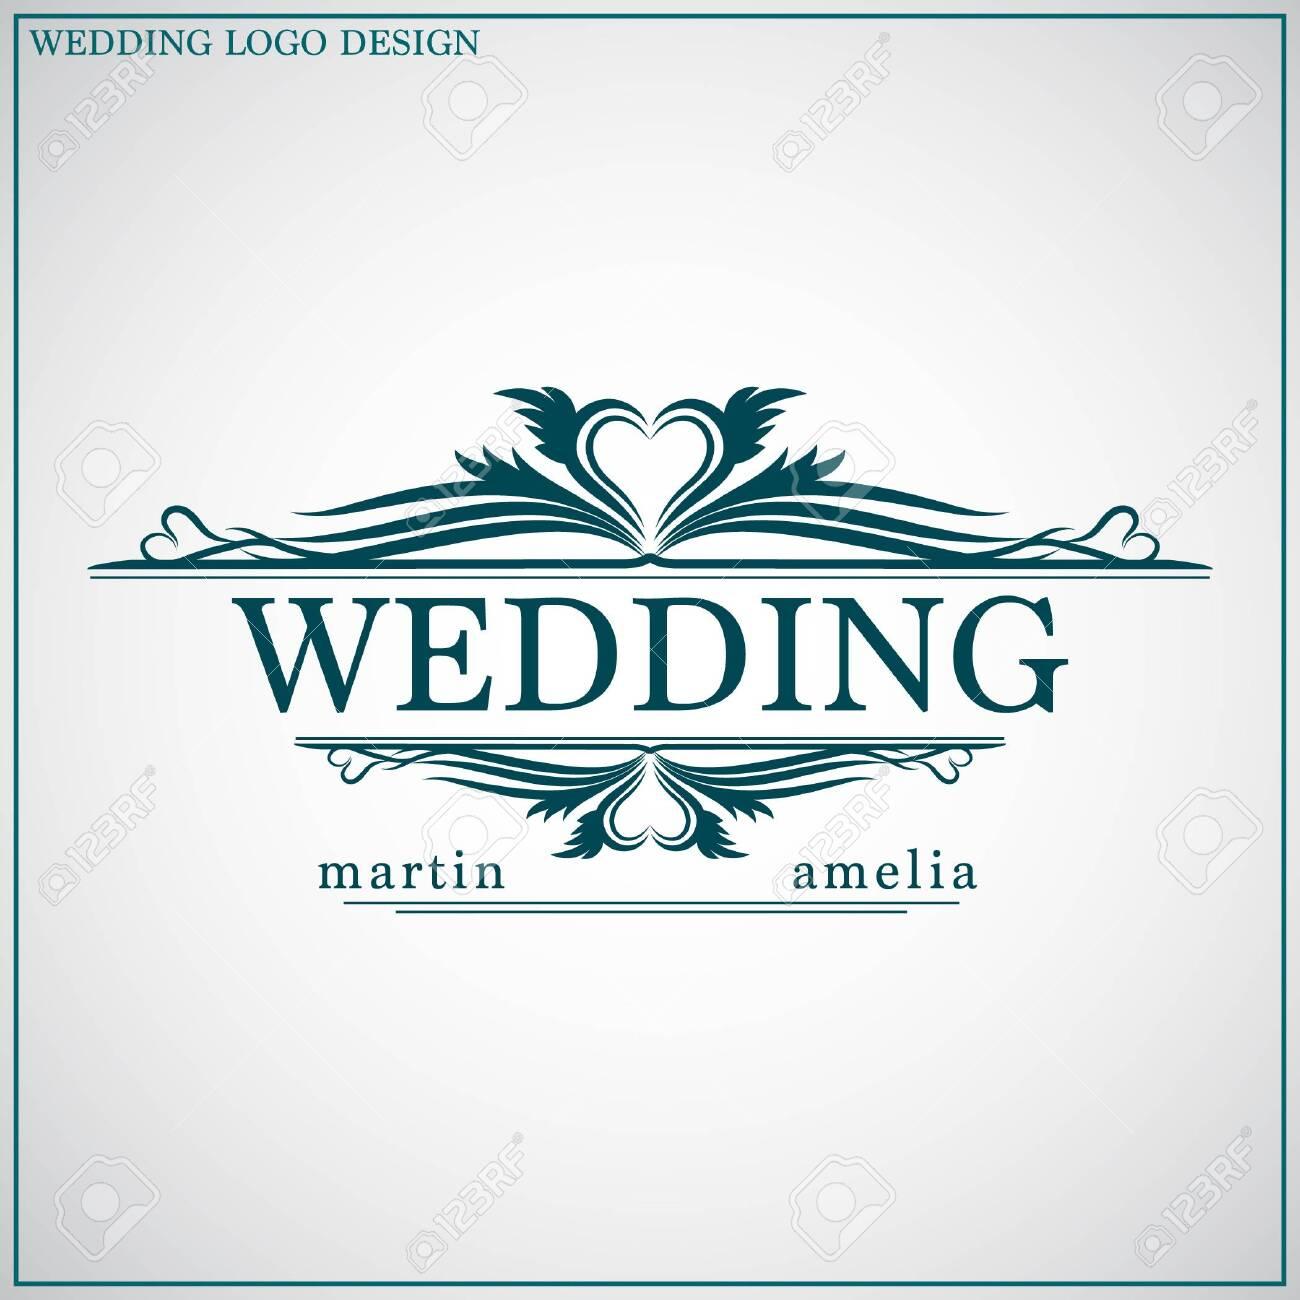 Wedding logo design template. Wedding logo vector. Feminine elegant..